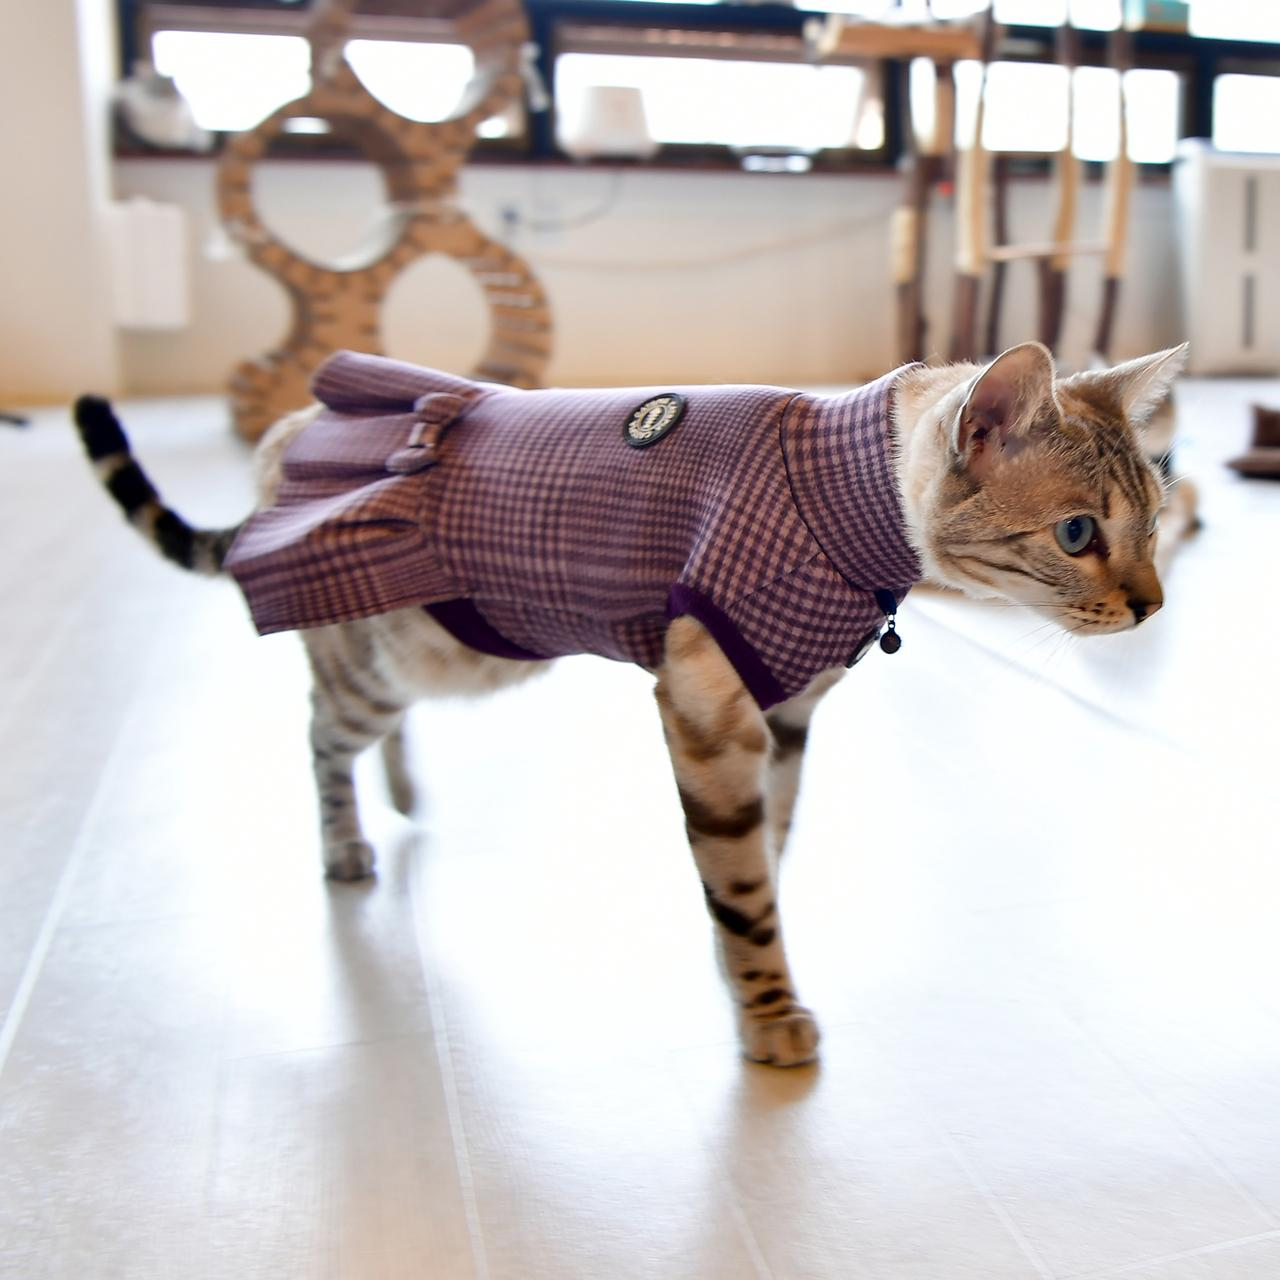 Leah Turtleneck Cat Dress by Catspia - Violet